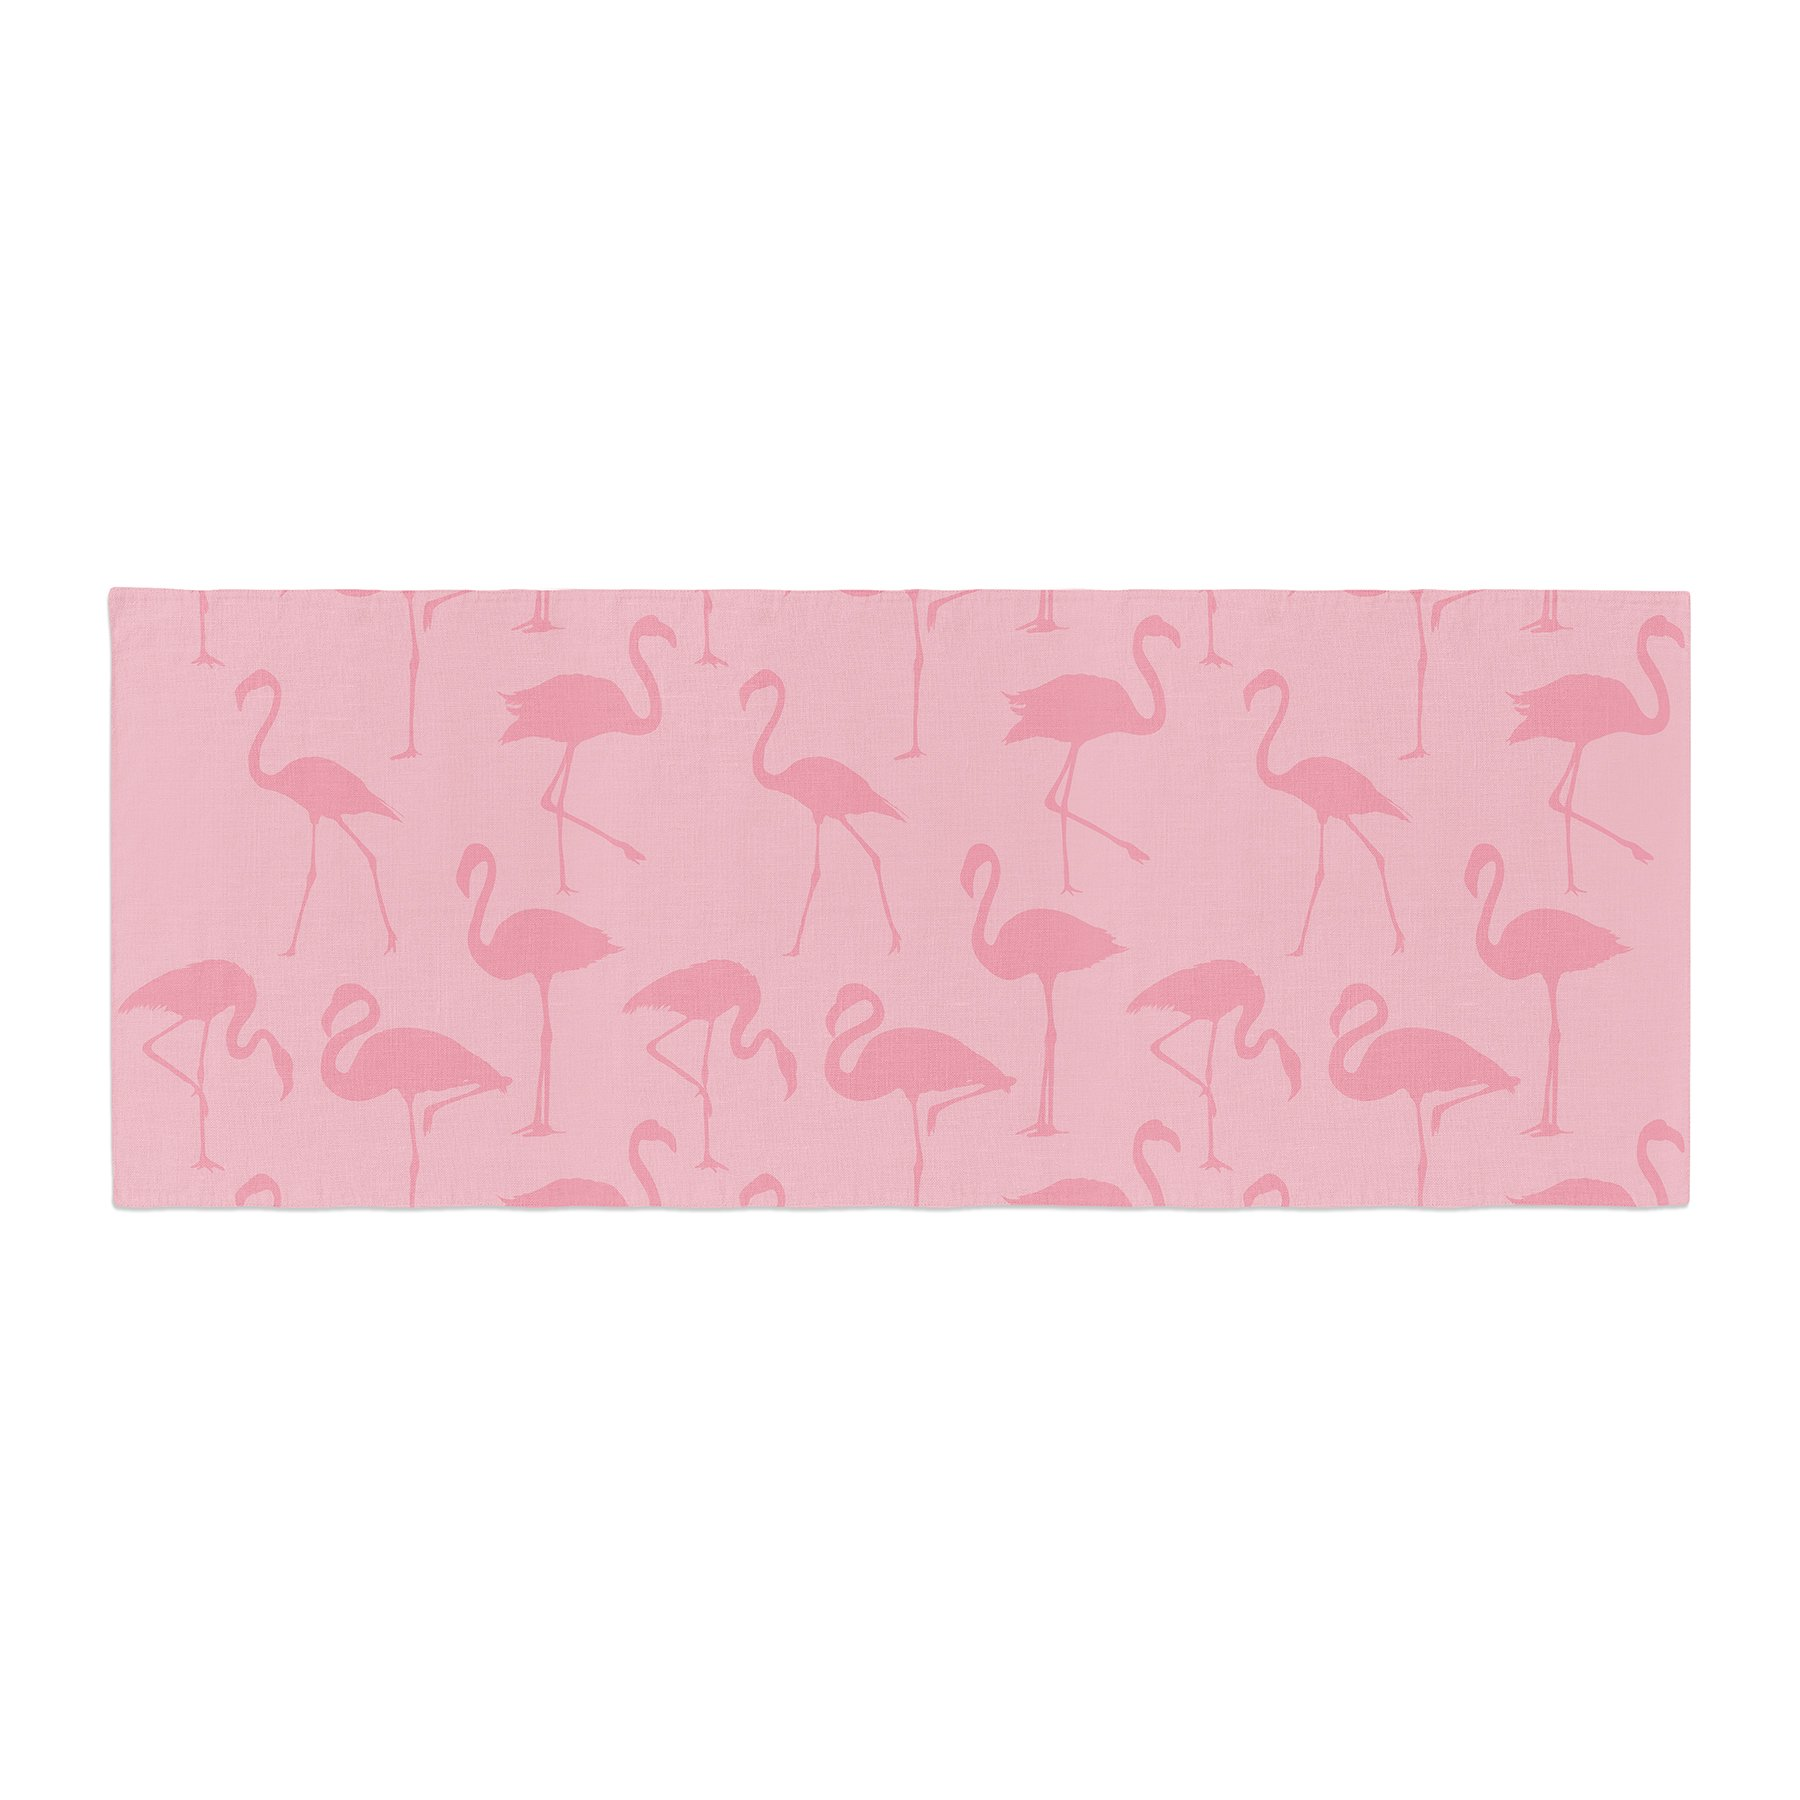 Kess InHouse Kess Original Pink On Pink Animals Abstract Bed Runner, 34'' x 86''